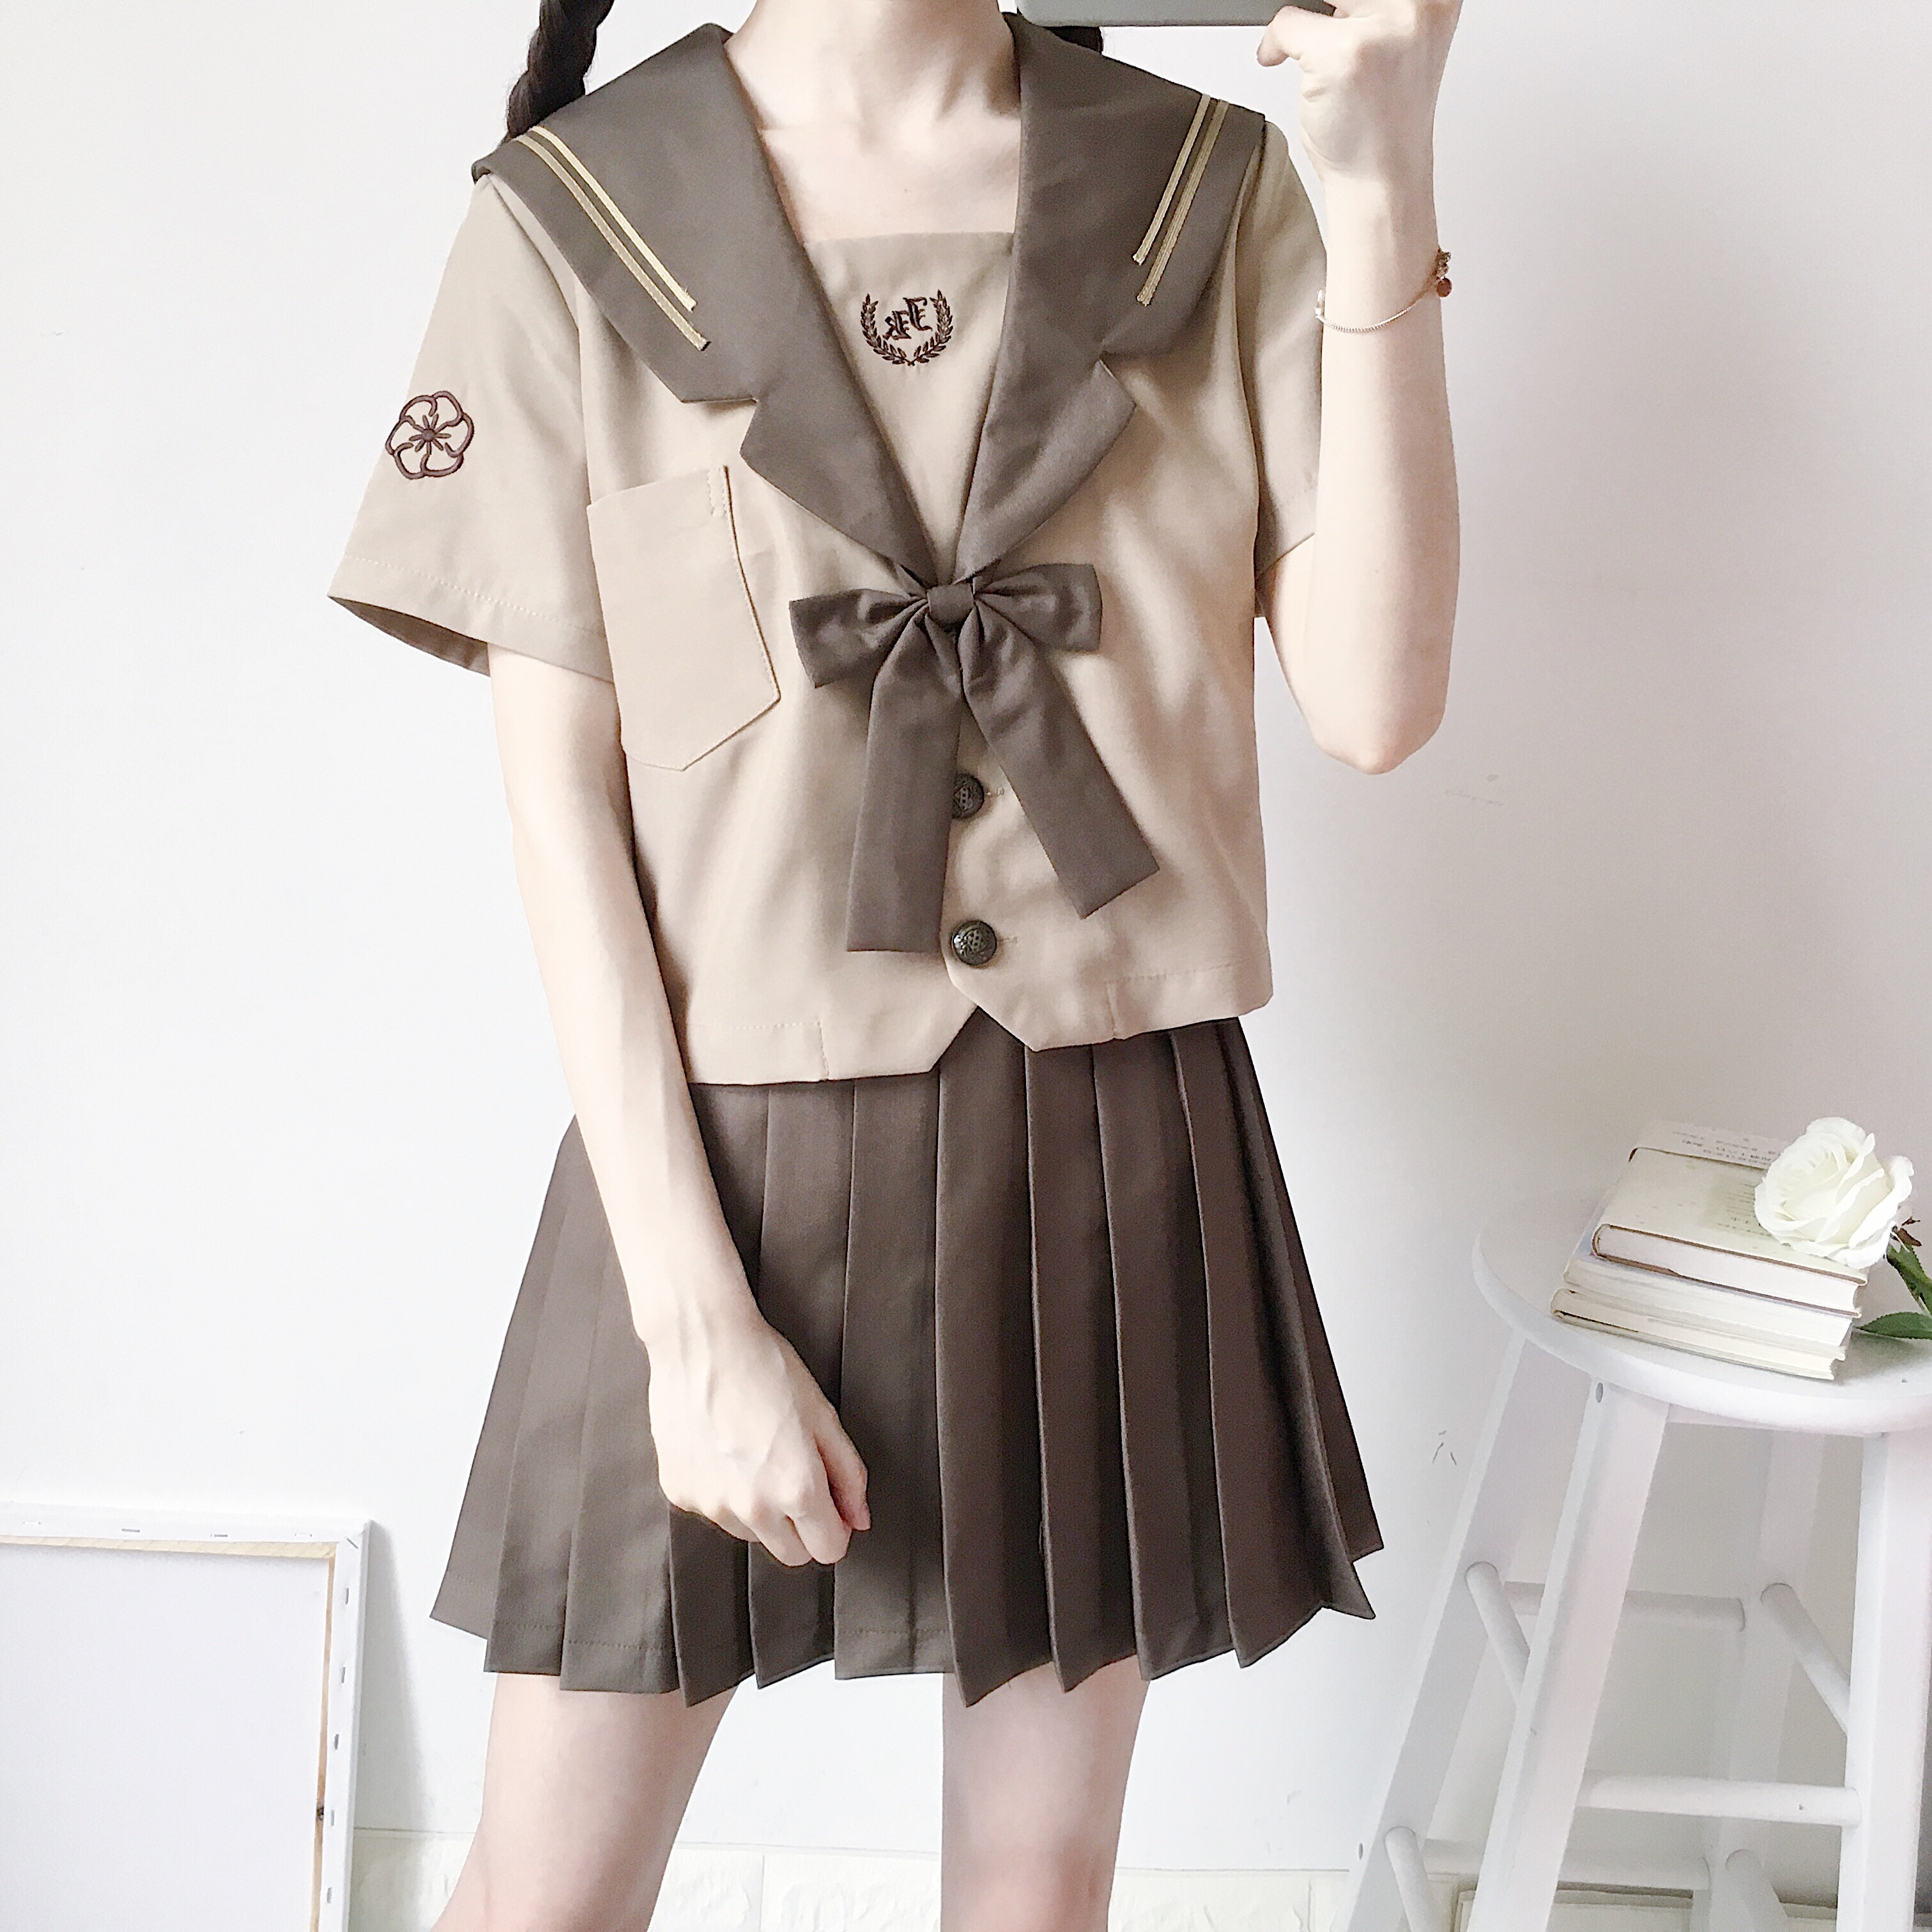 Japanese Uniforms Navy Sailor Suit For Women Kansai Students Long Sleeve Costume School Uniform For Girls